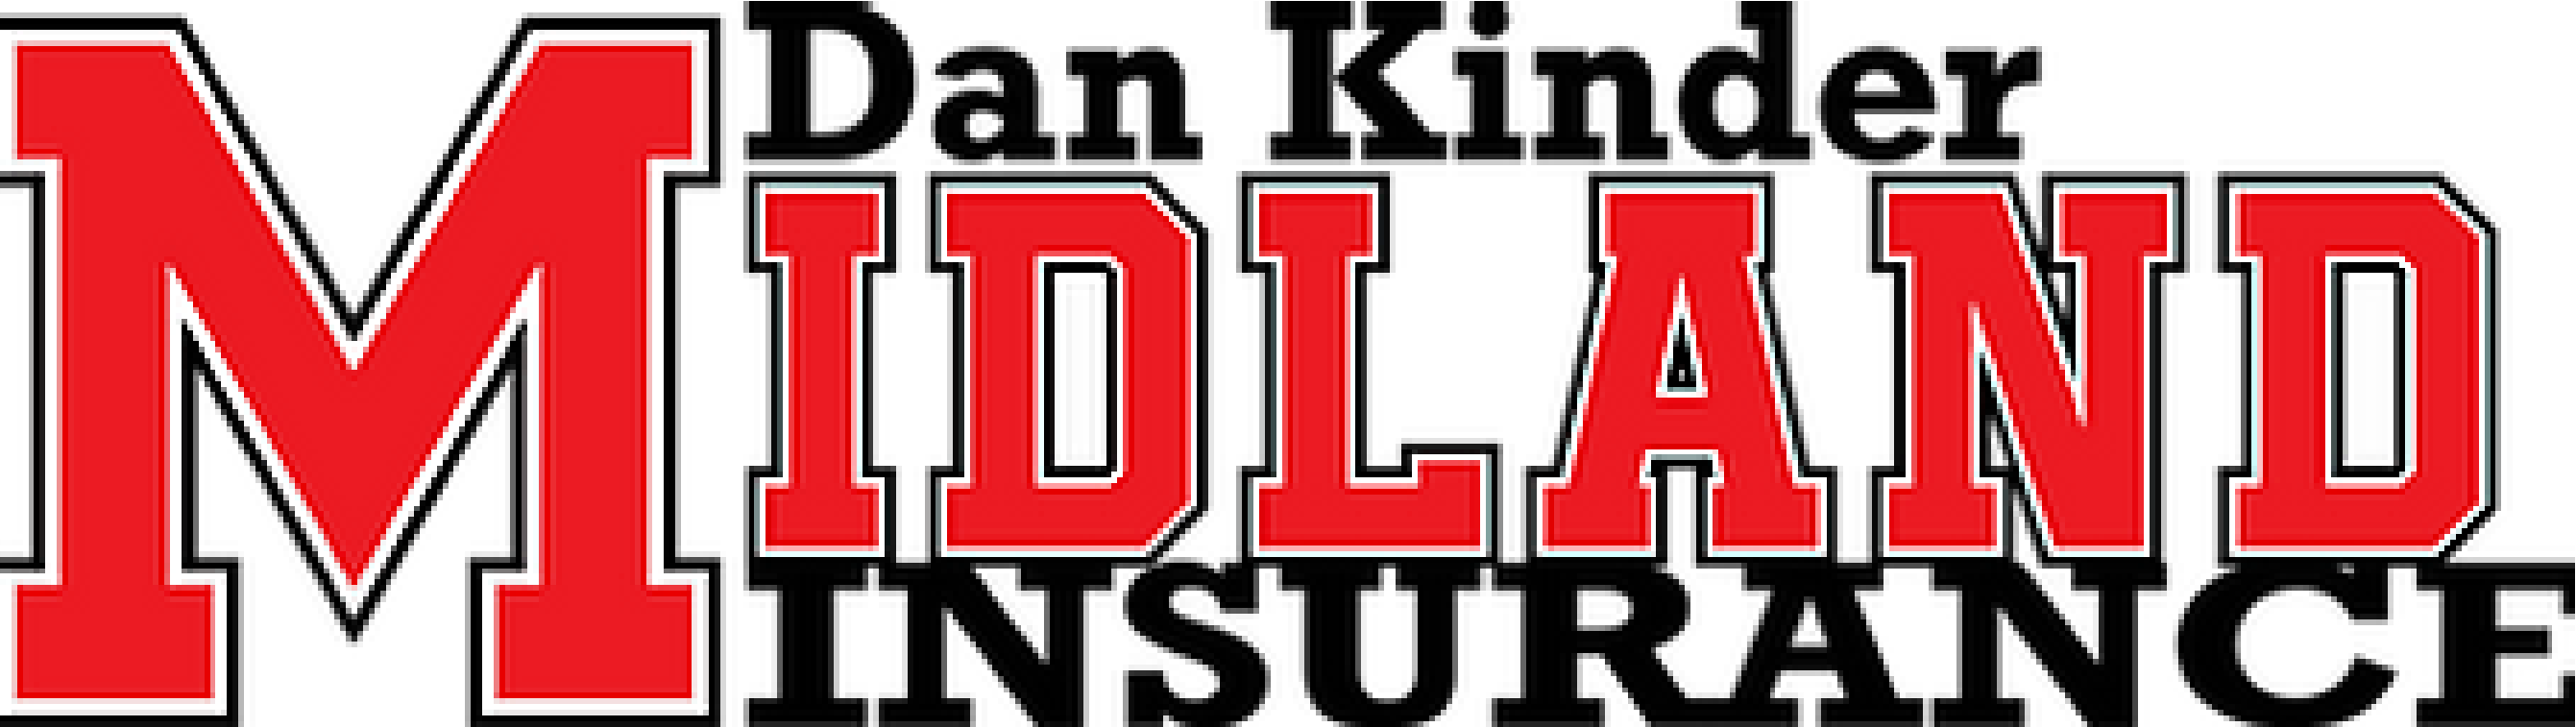 Dan Kinder - Midland Insurance logo